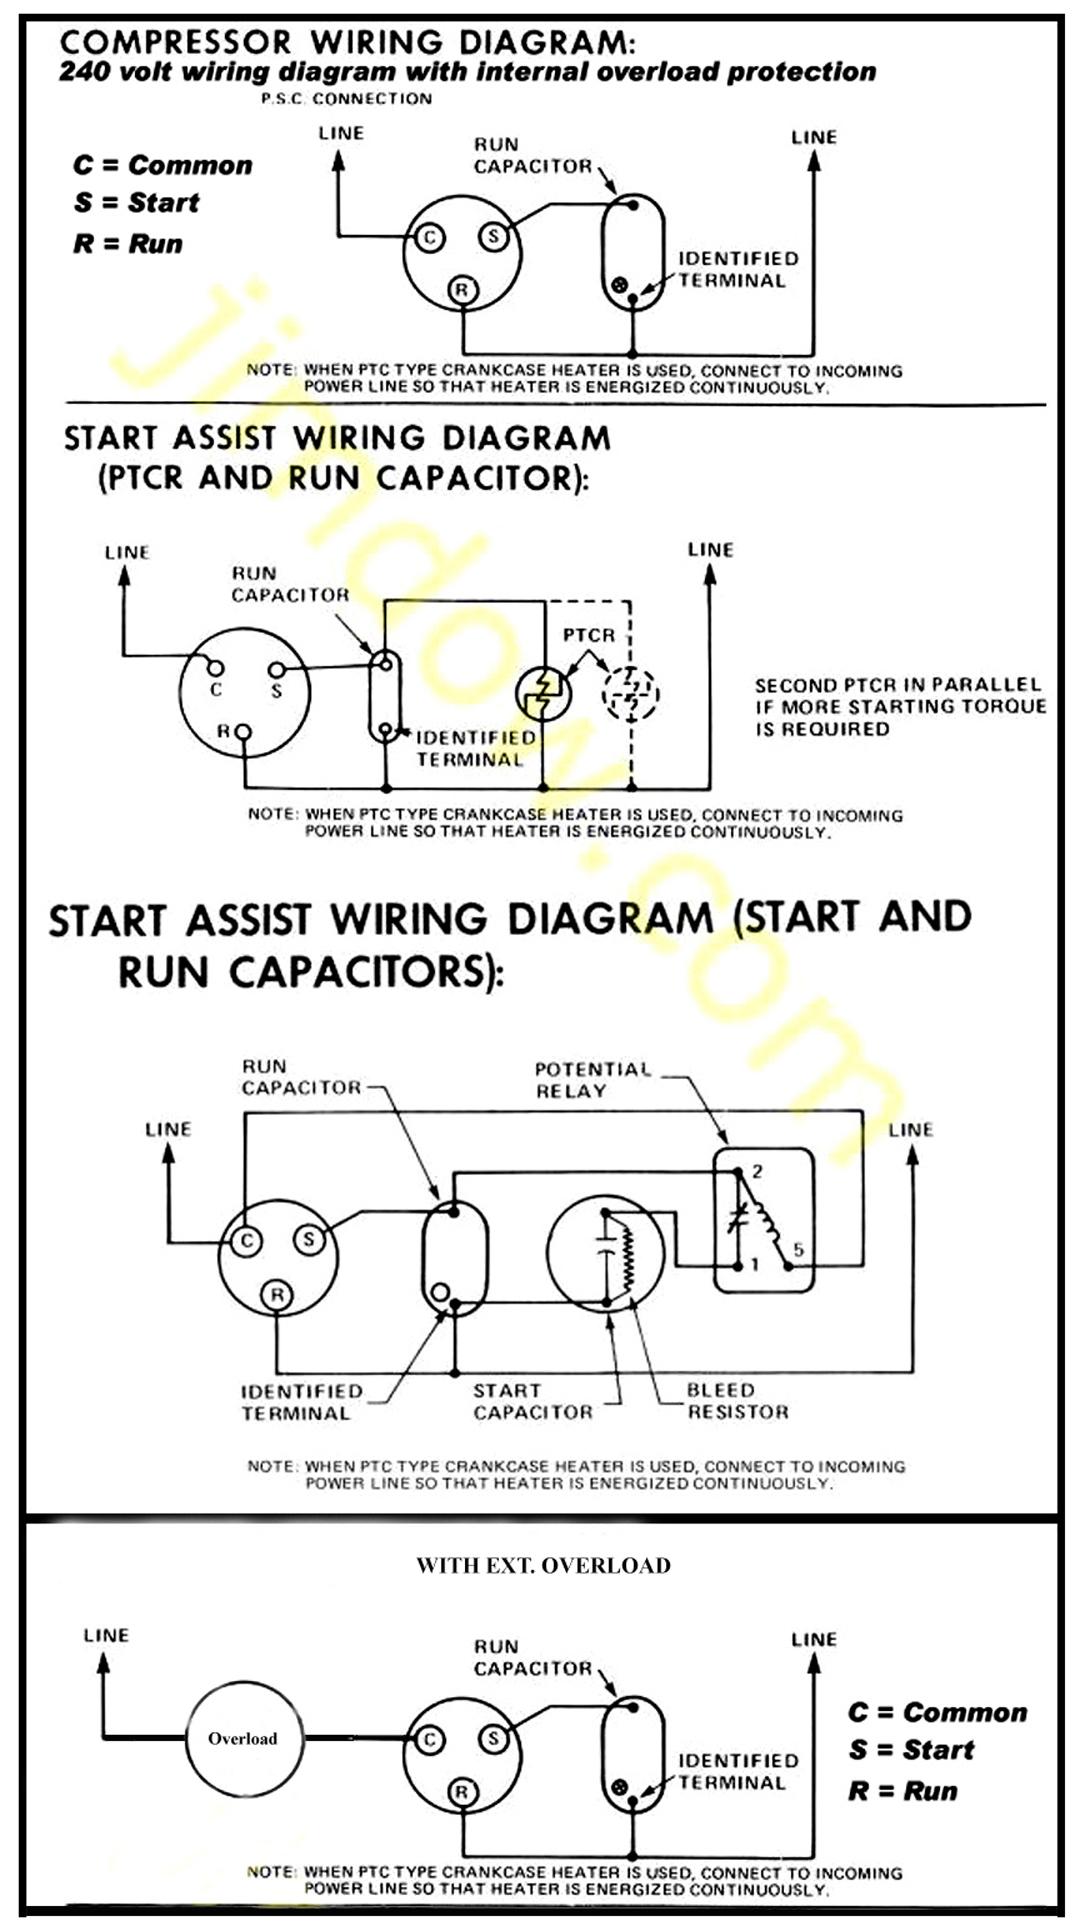 [GJFJ_338]  Bristol Compressor Wiring Diagram - Notifier Fire Alarm Wiring Diagram for Wiring  Diagram Schematics | Compressor Wiring Schematic |  | Wiring Diagram Schematics